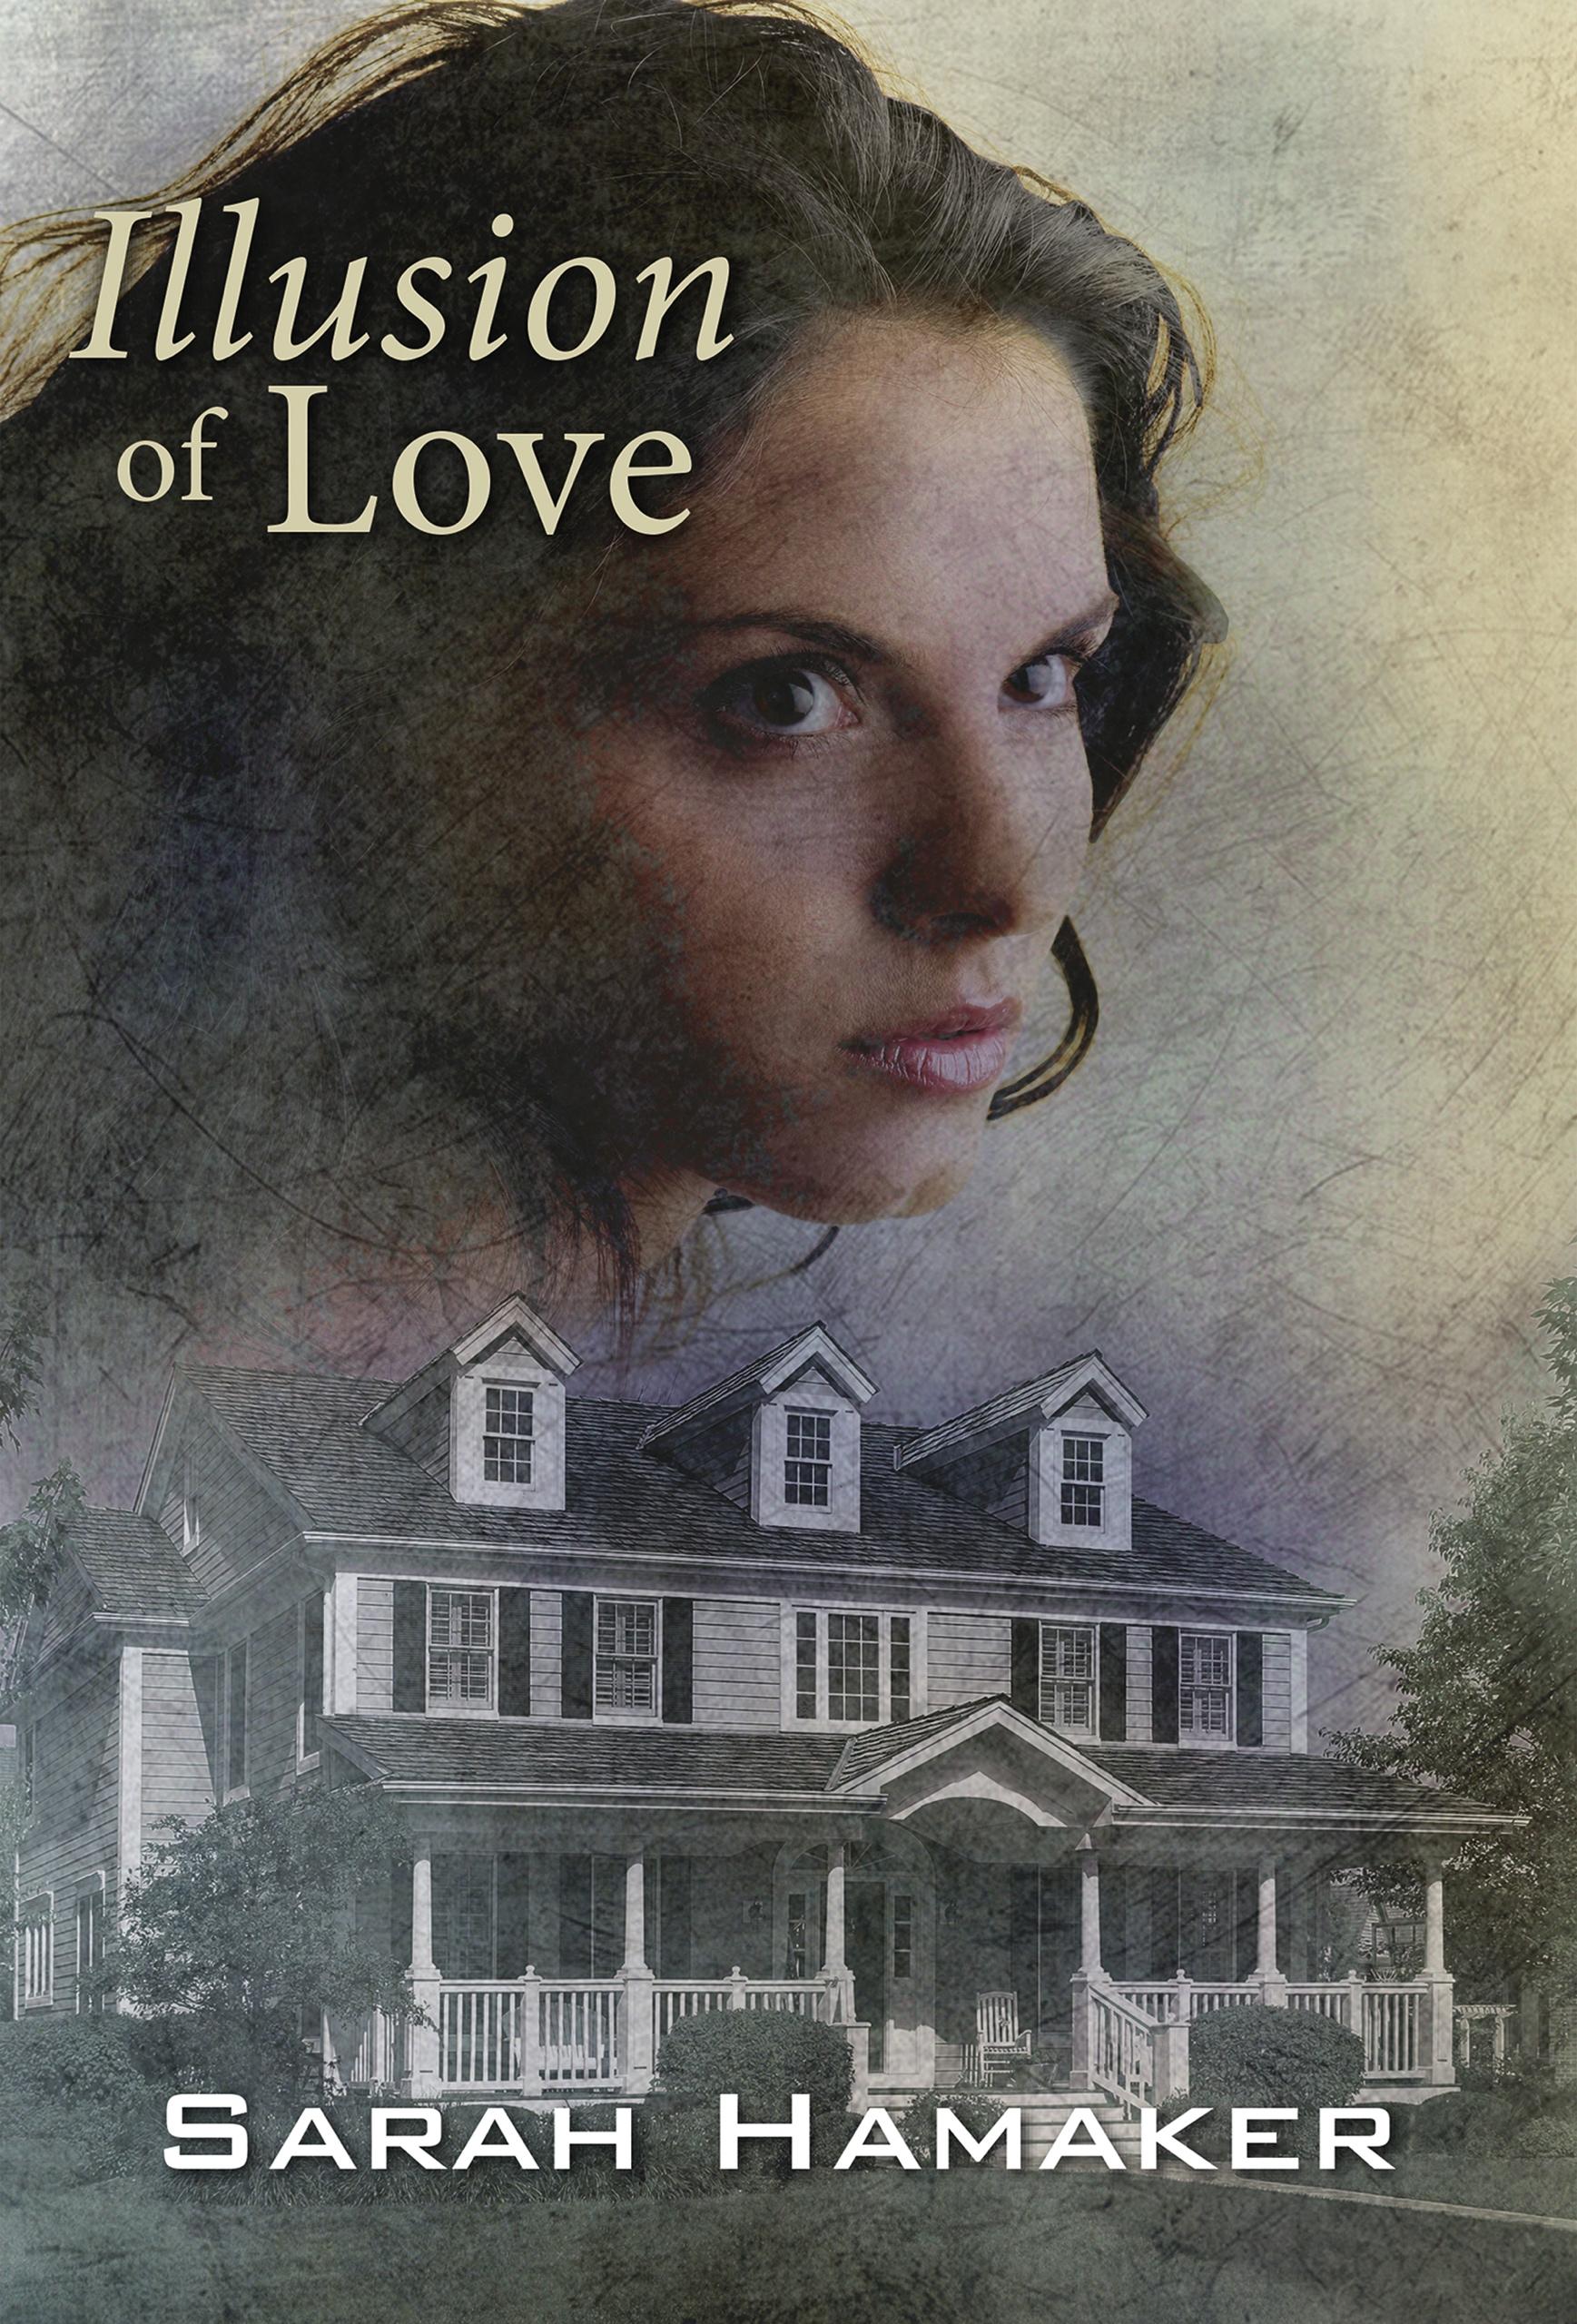 Illusion-of-Love-Kindle